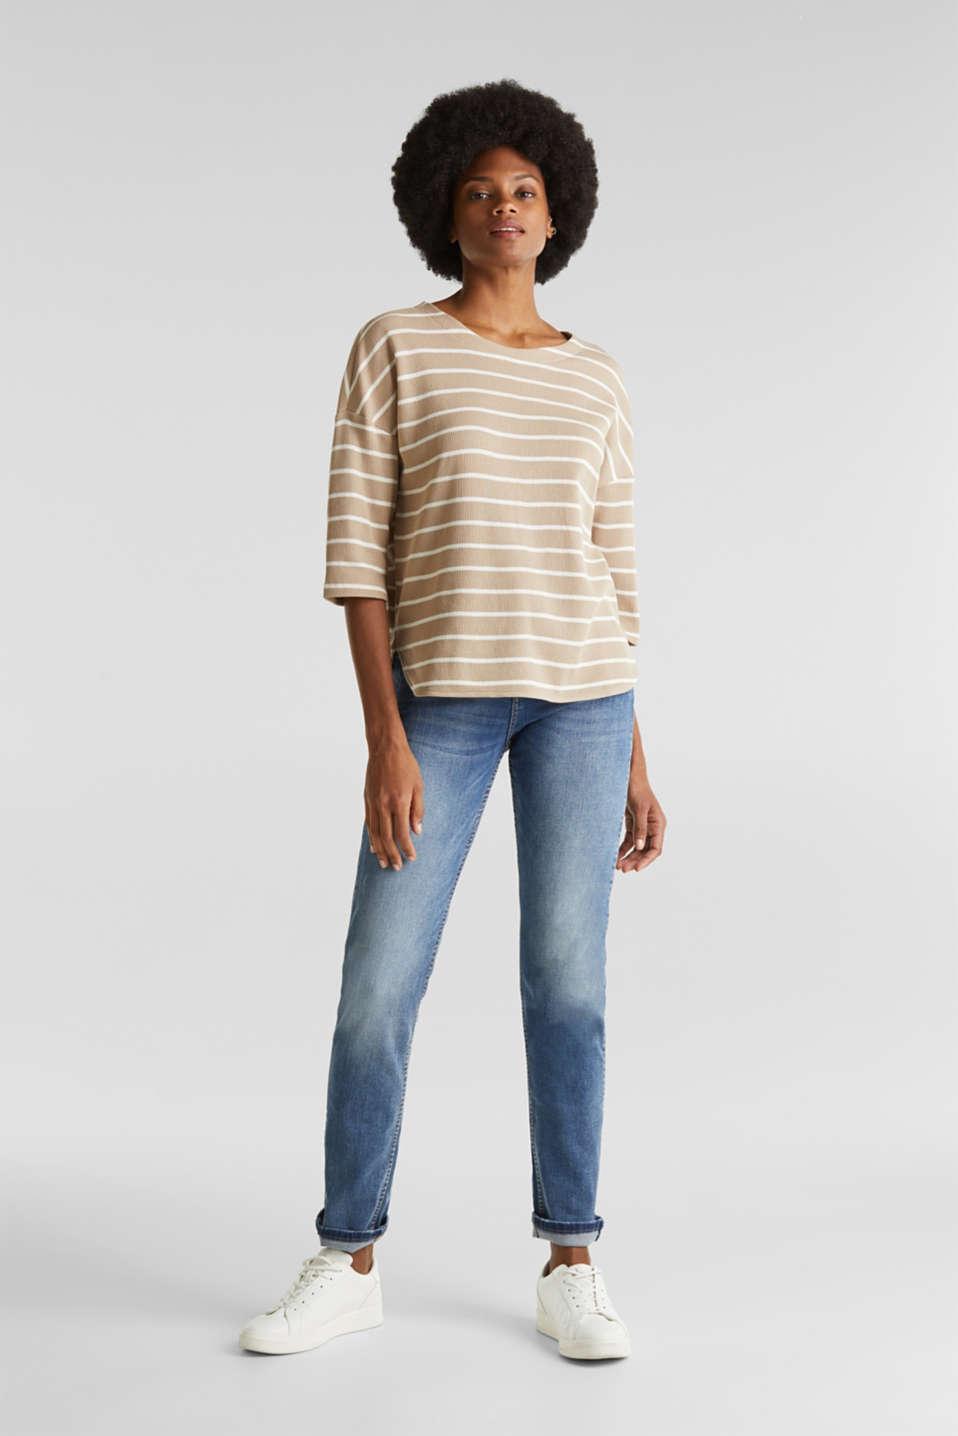 Piqué T-shirt with a casual cut, 100% cotton, BEIGE, detail image number 1